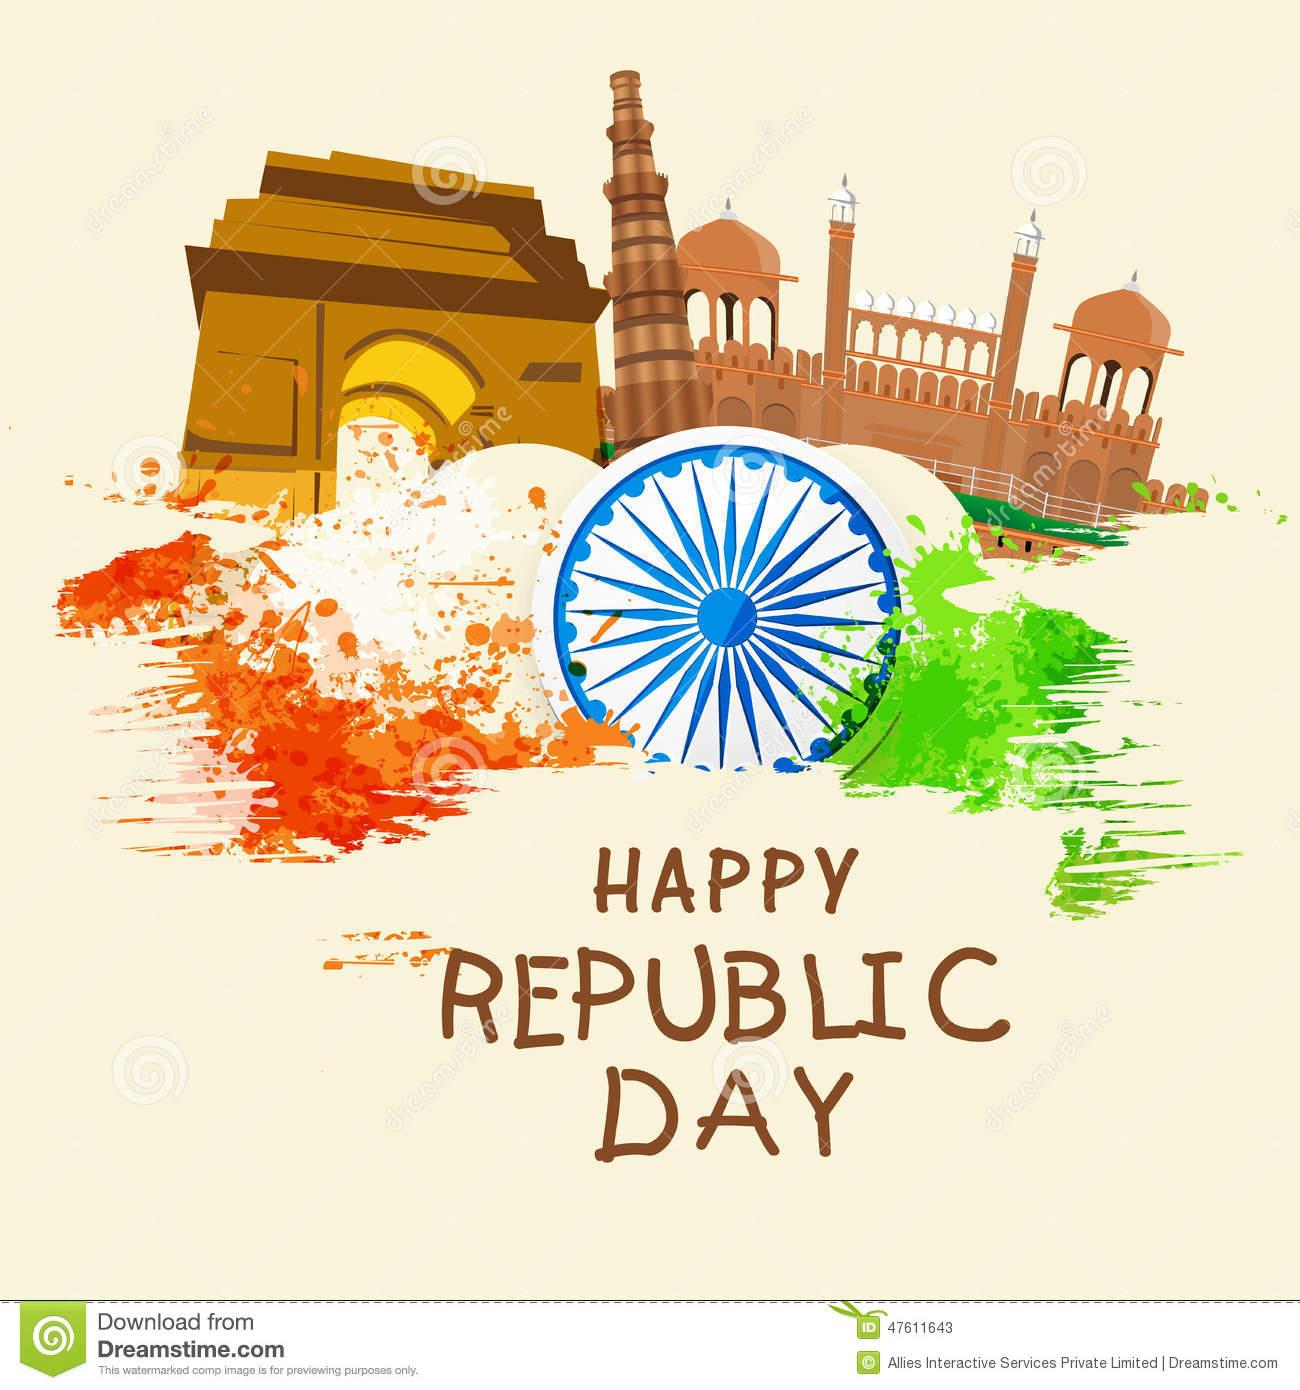 Indian Republic Day Celebration With Famous Monuments And Ashoka.